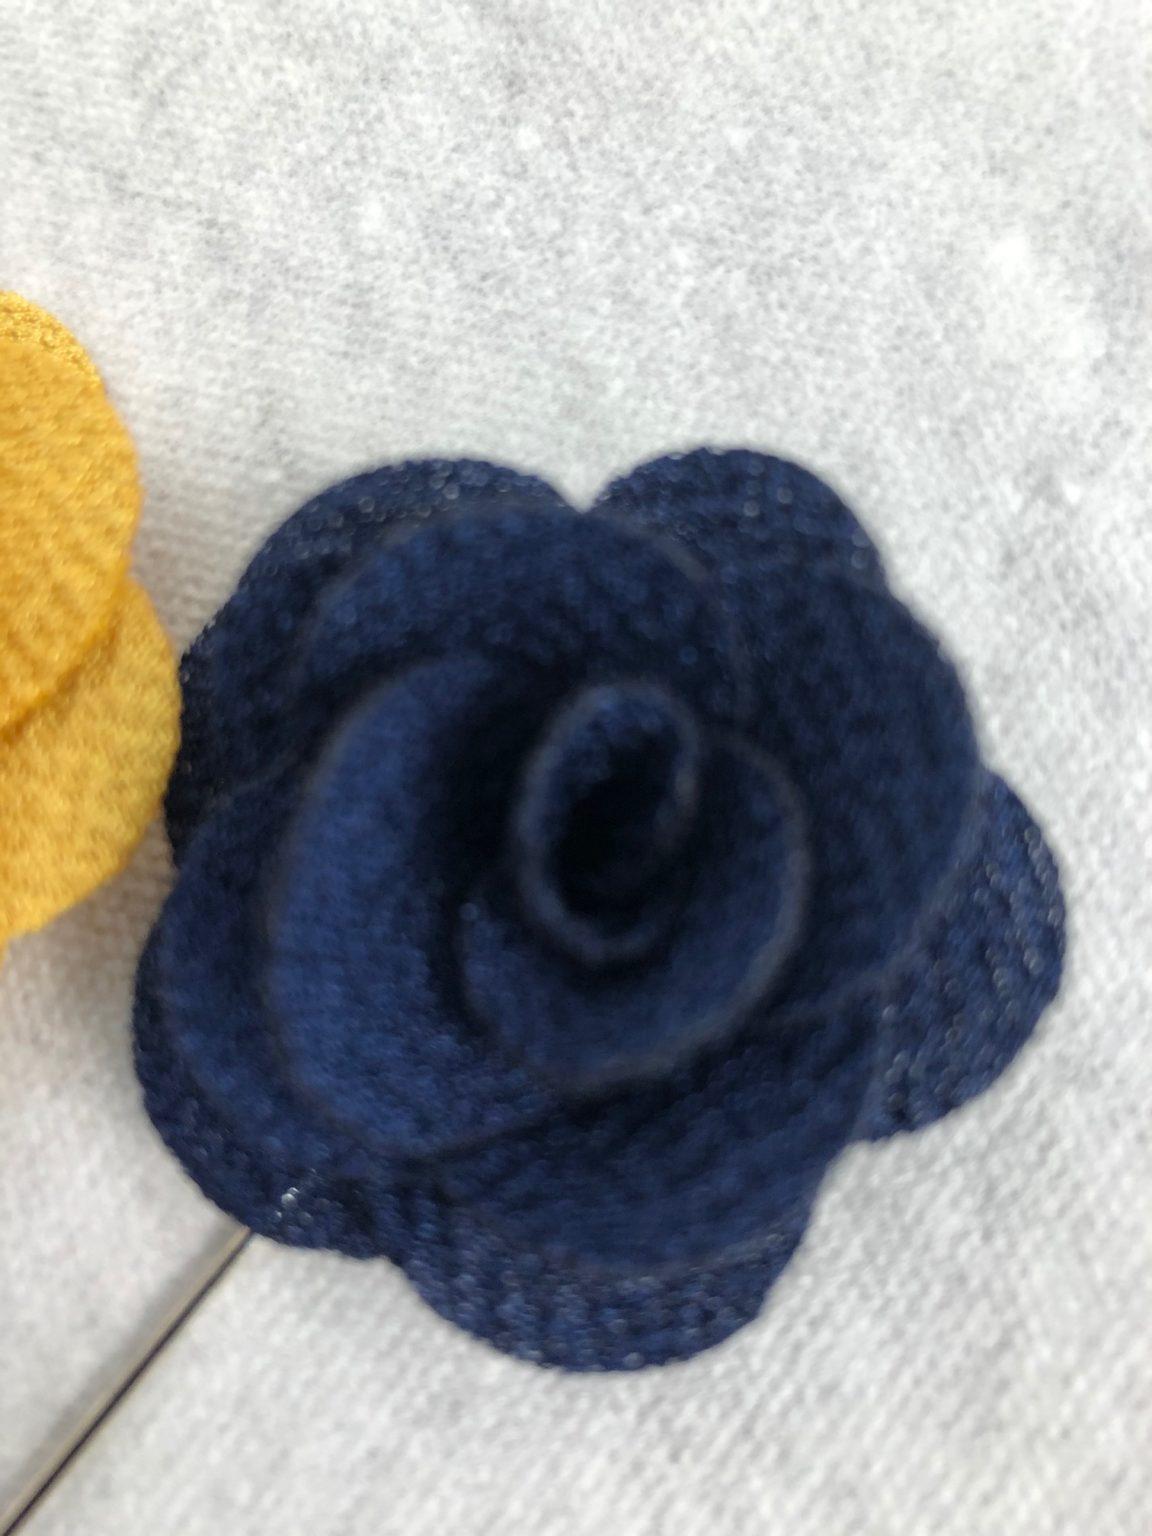 Flower Lapel Pins